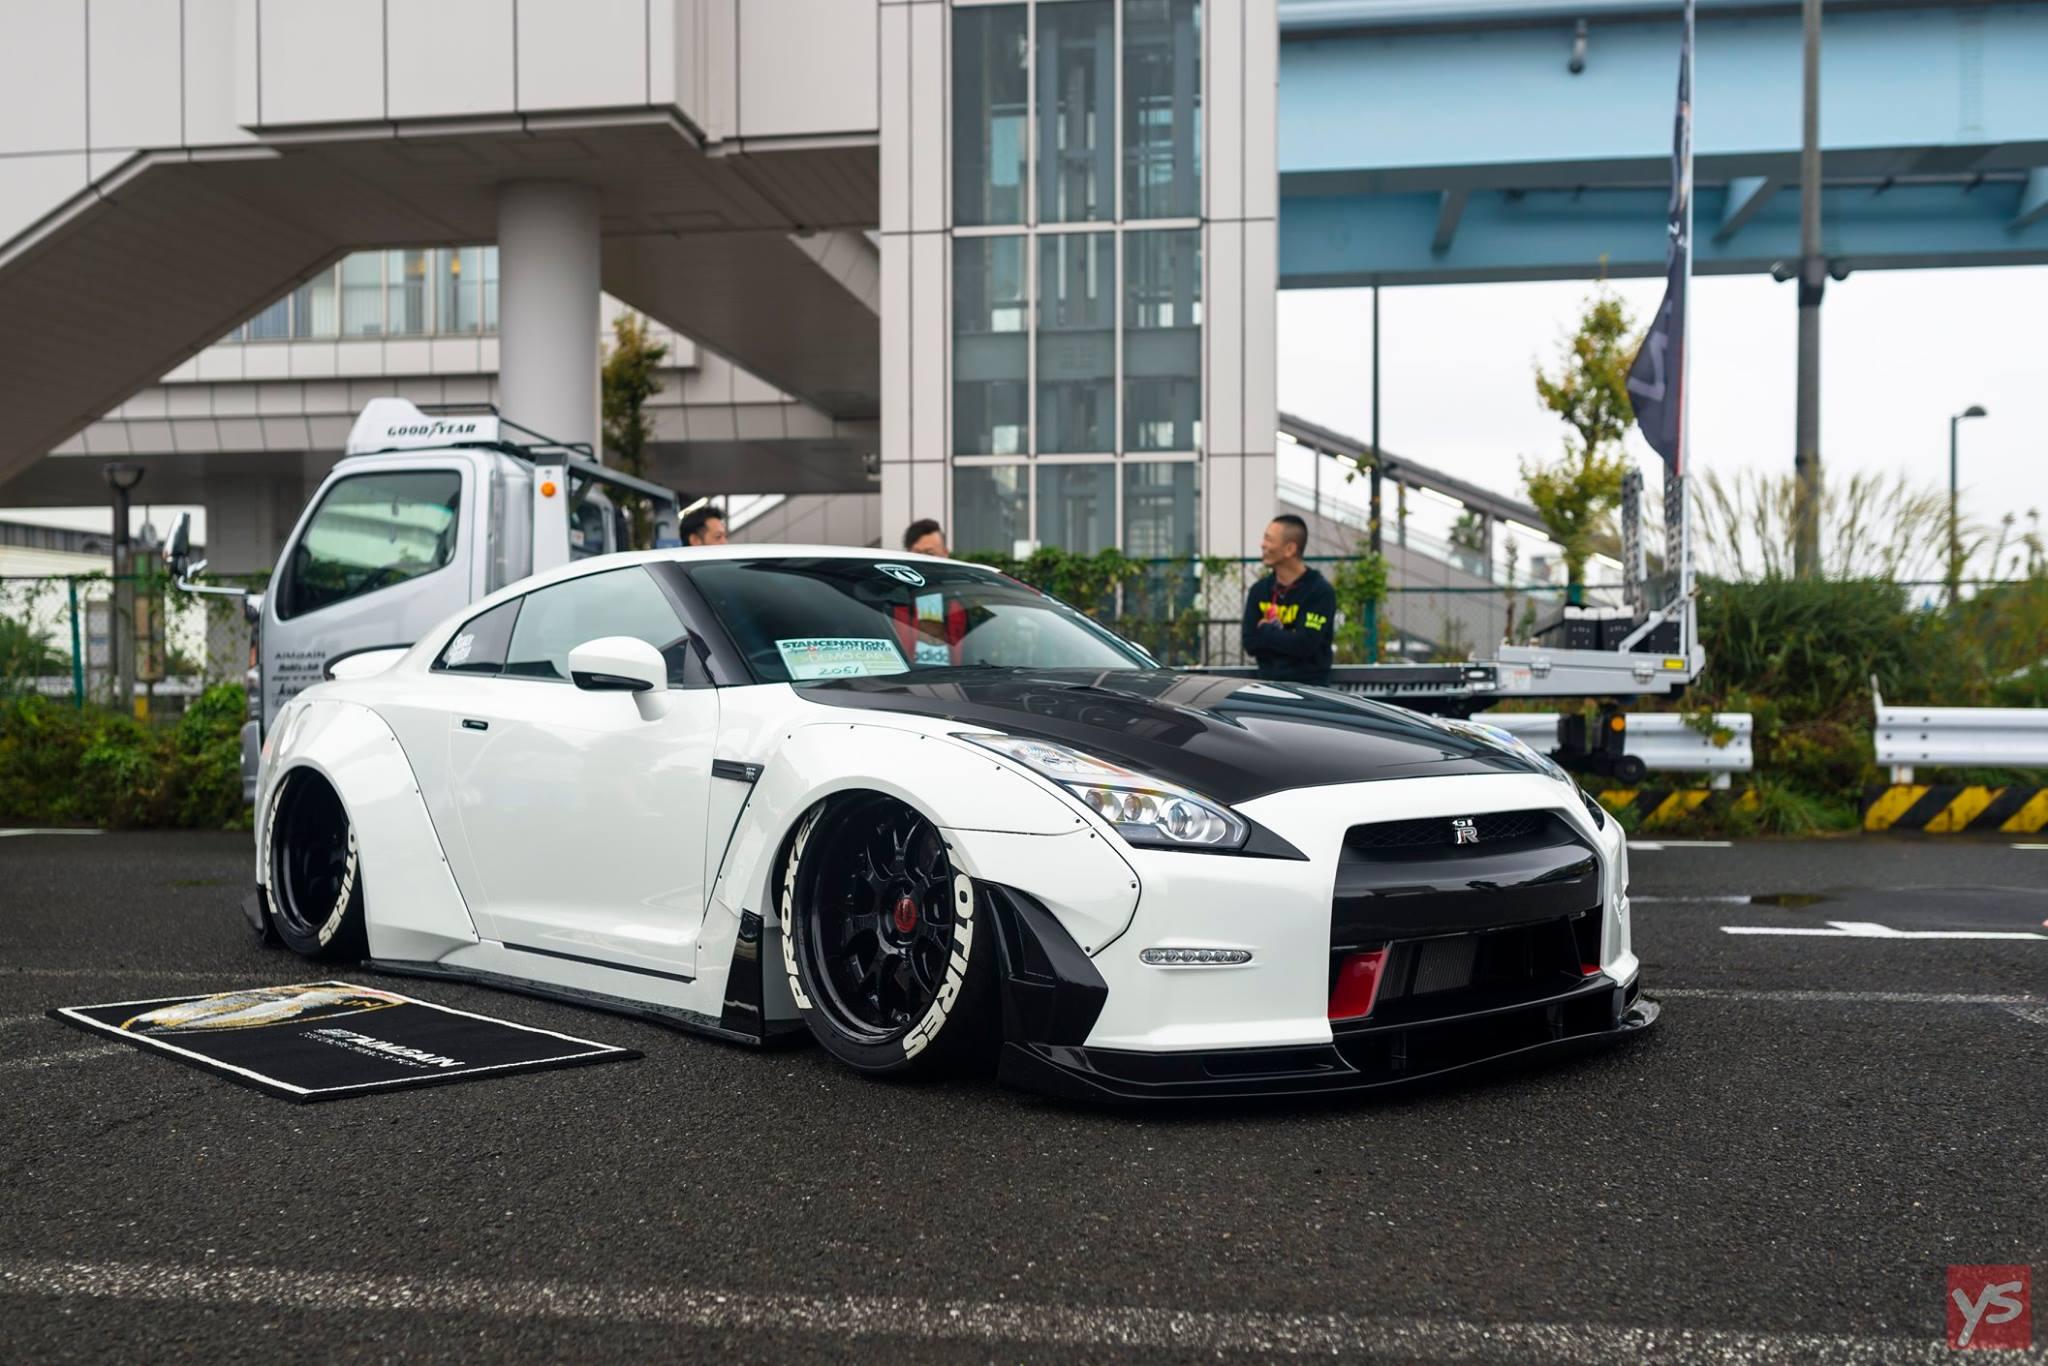 Nissan Skyline GTR R31, R32, R33, R34, R35 Specs, Images Info Nissan gtr r35 pictures